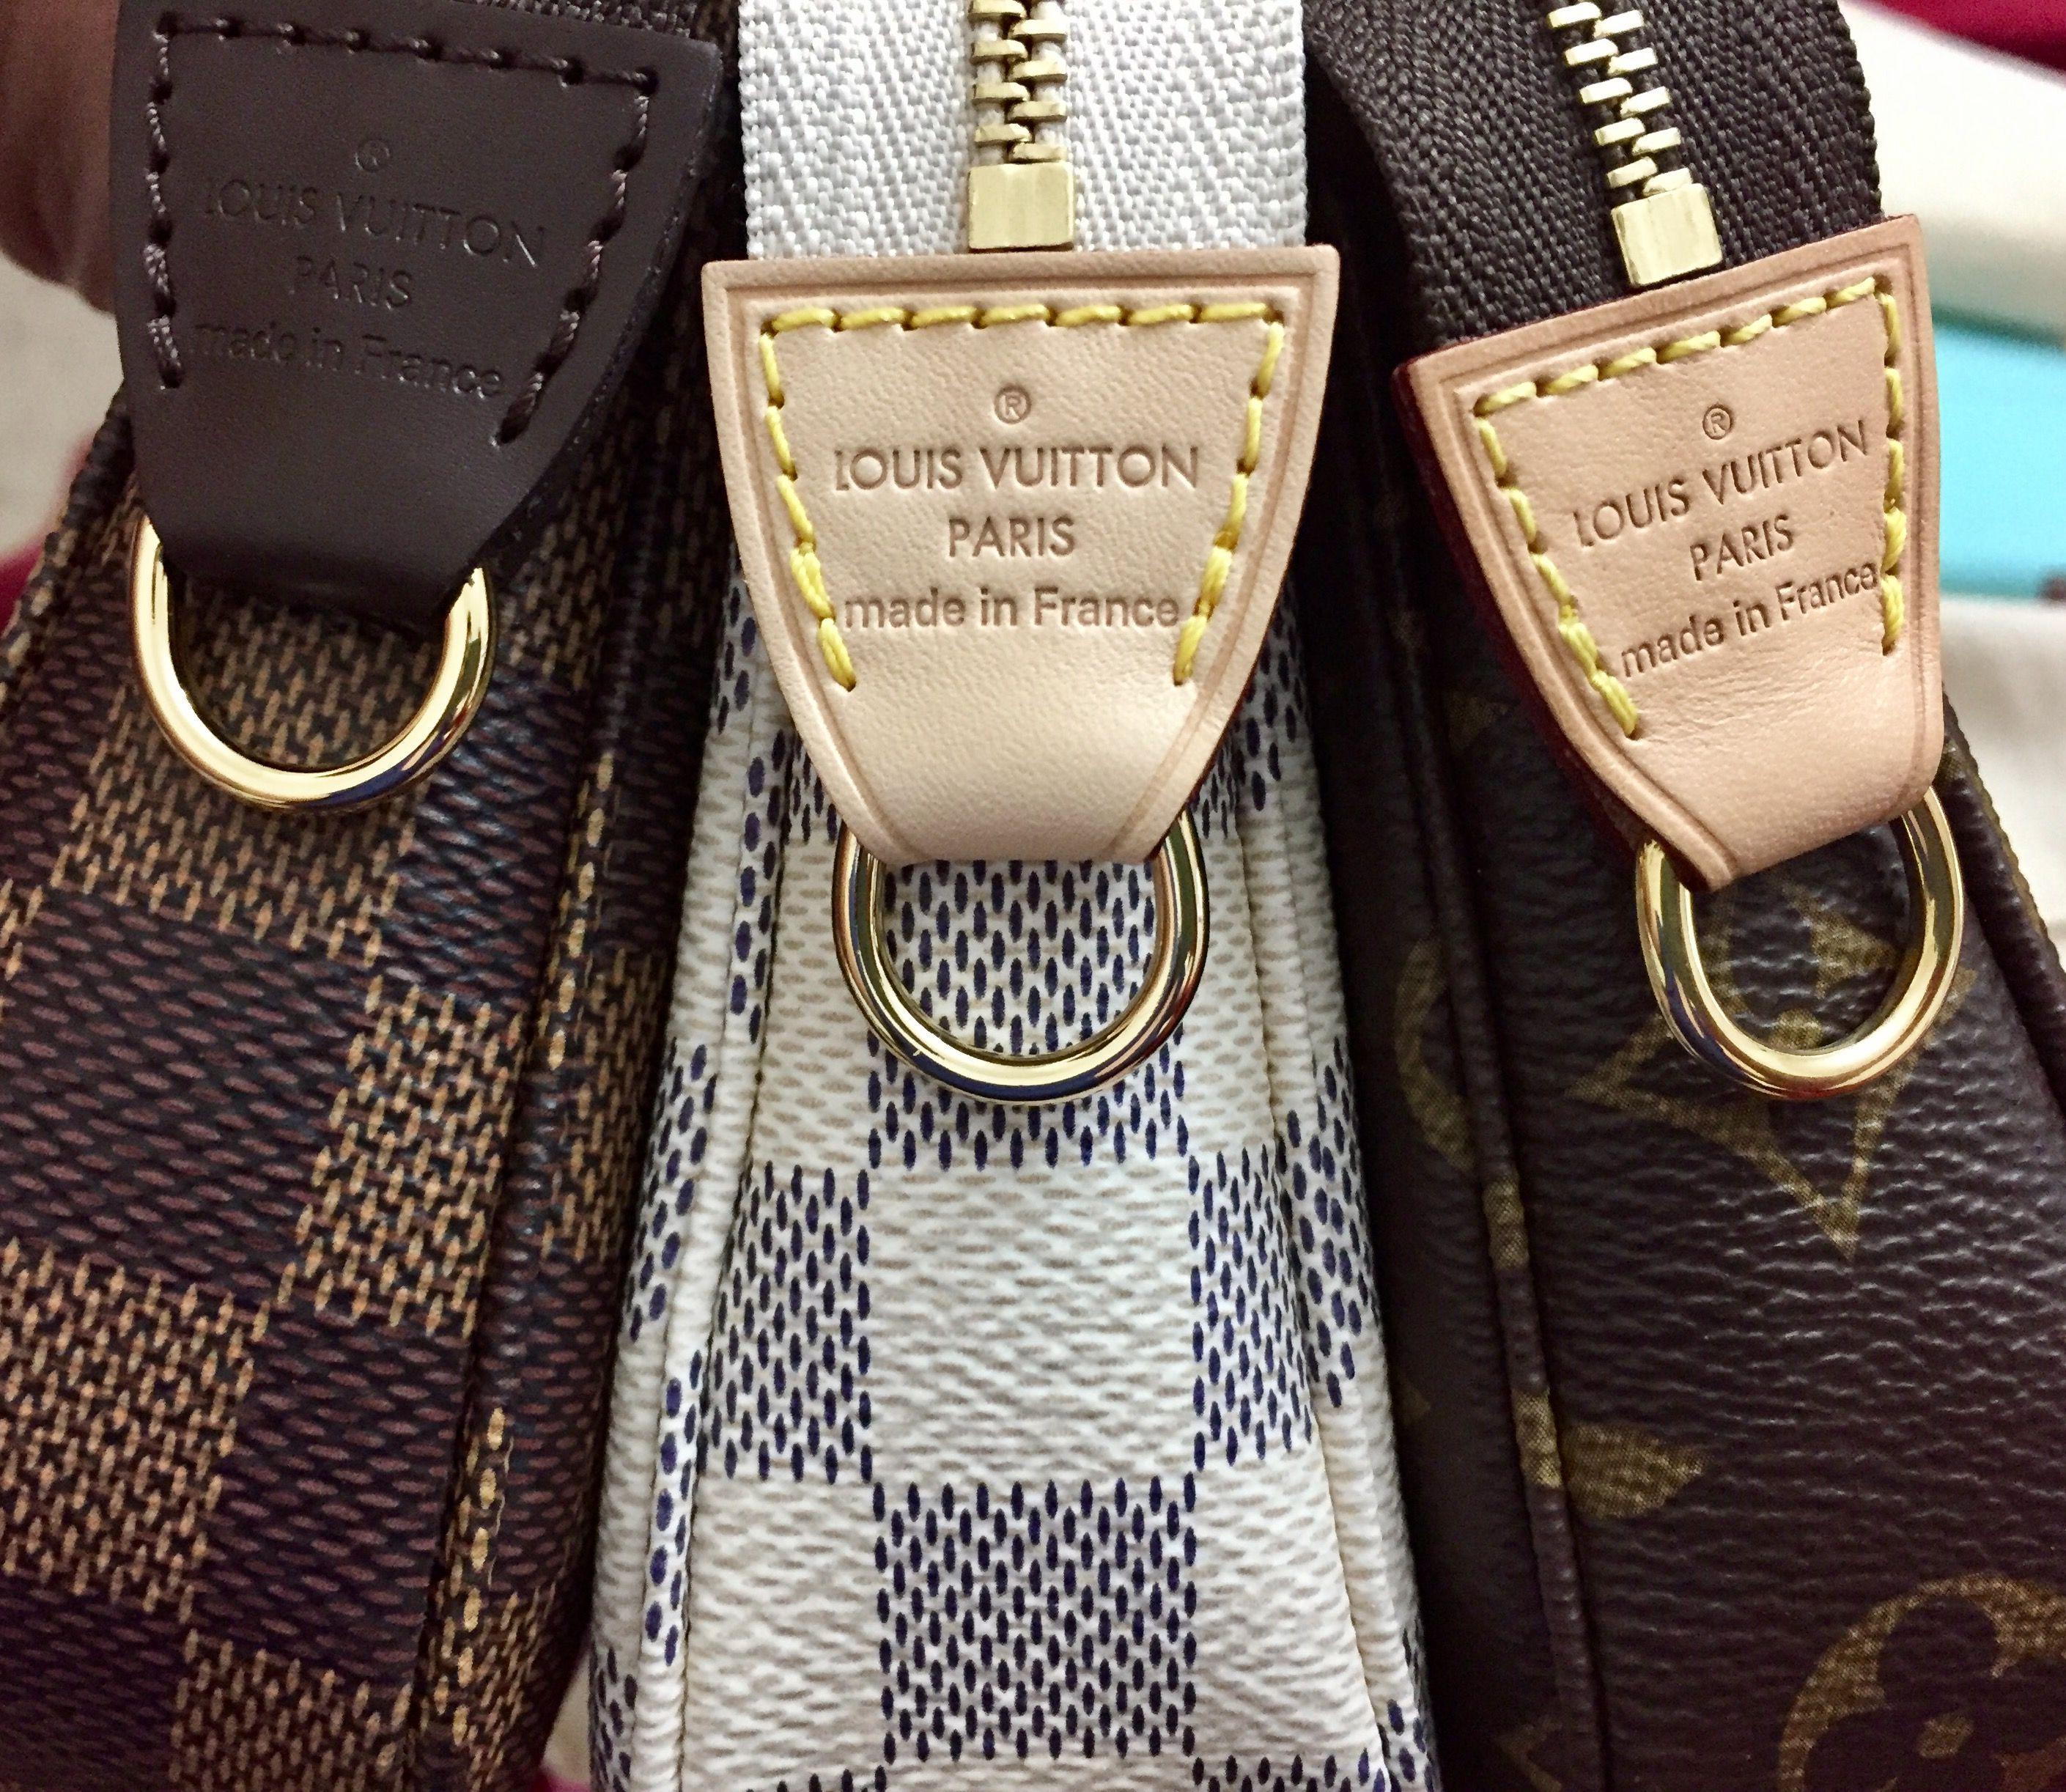 Louis Vuitton Pochette Accessoires NM in damier ebene, damier azur, monogram